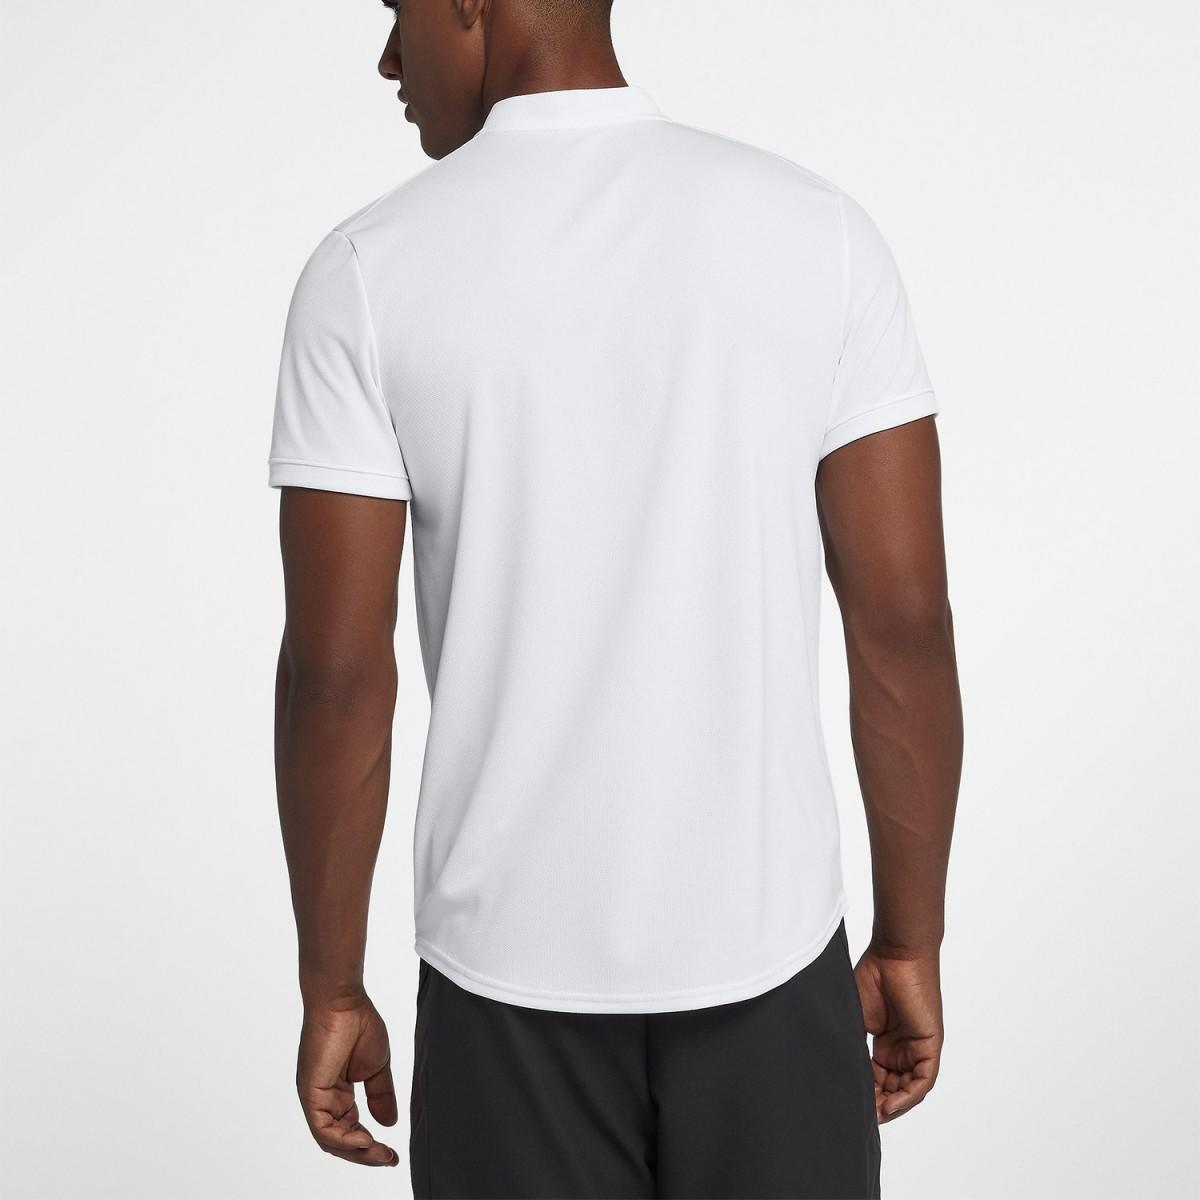 557f3851 ... Теннисная футболка мужская Nike Court Dry Blade Polo white/black ...